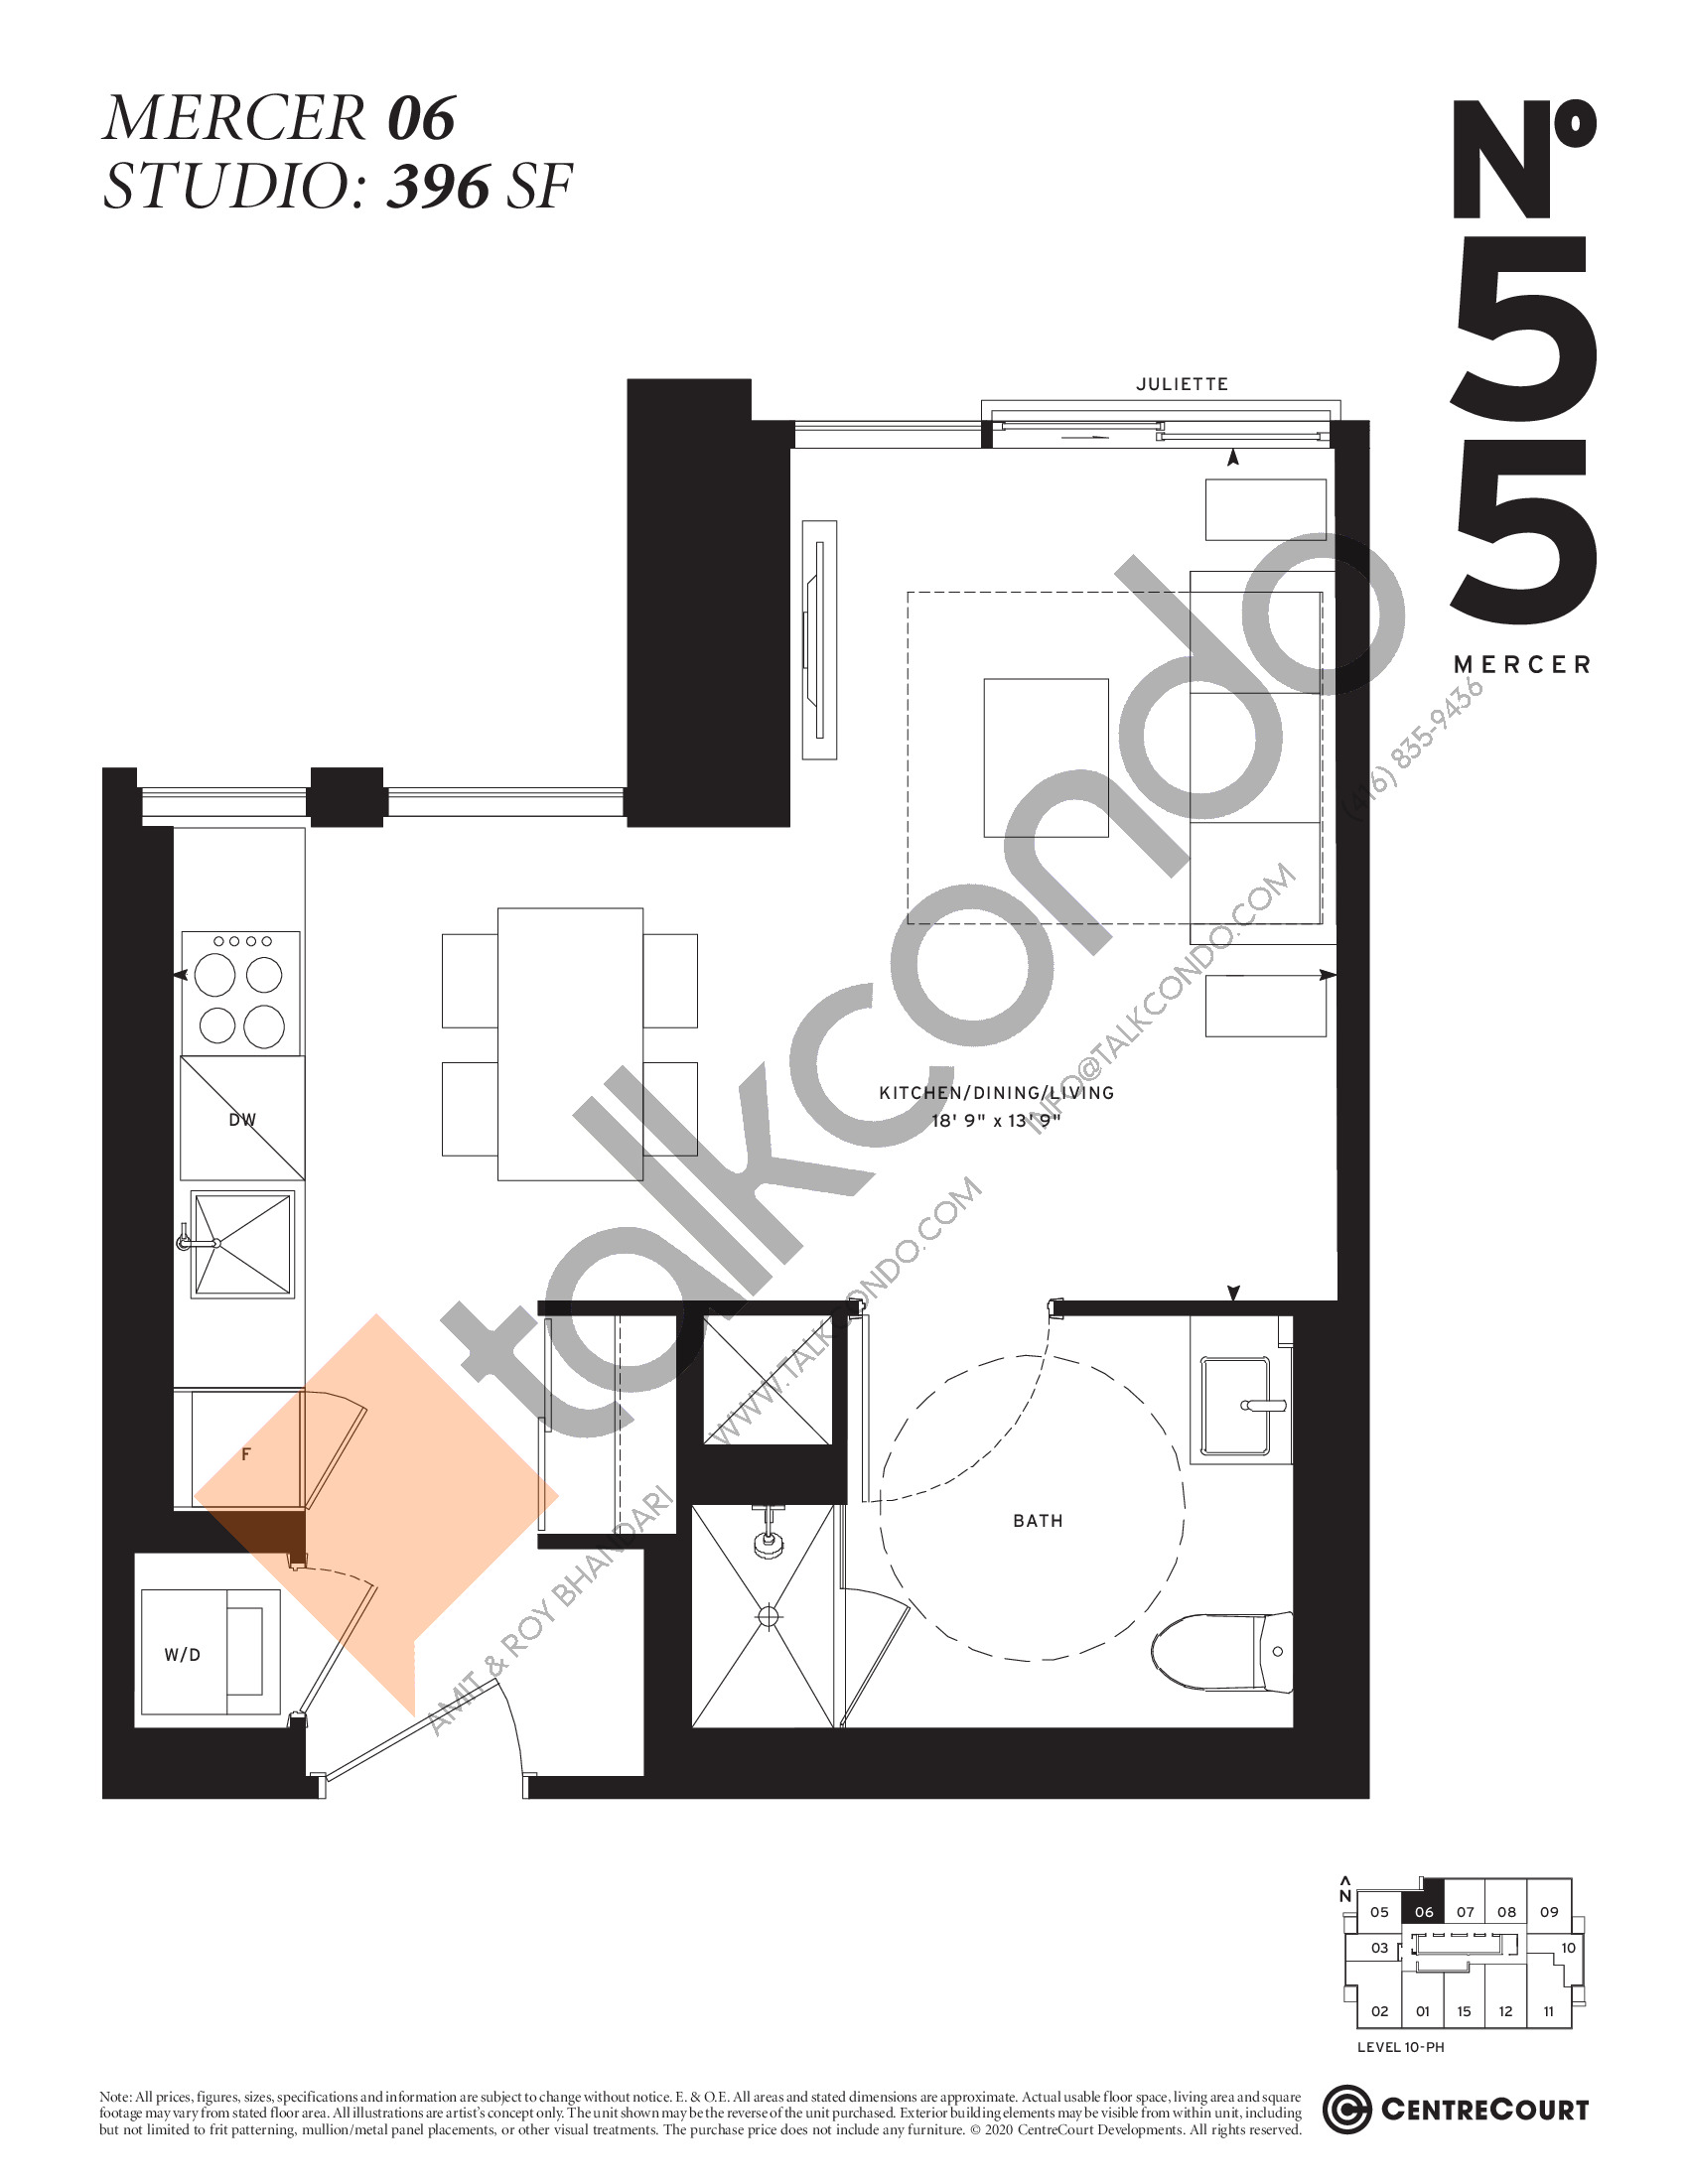 Mercer 06 Floor Plan at No. 55 Mercer Condos - 396 sq.ft